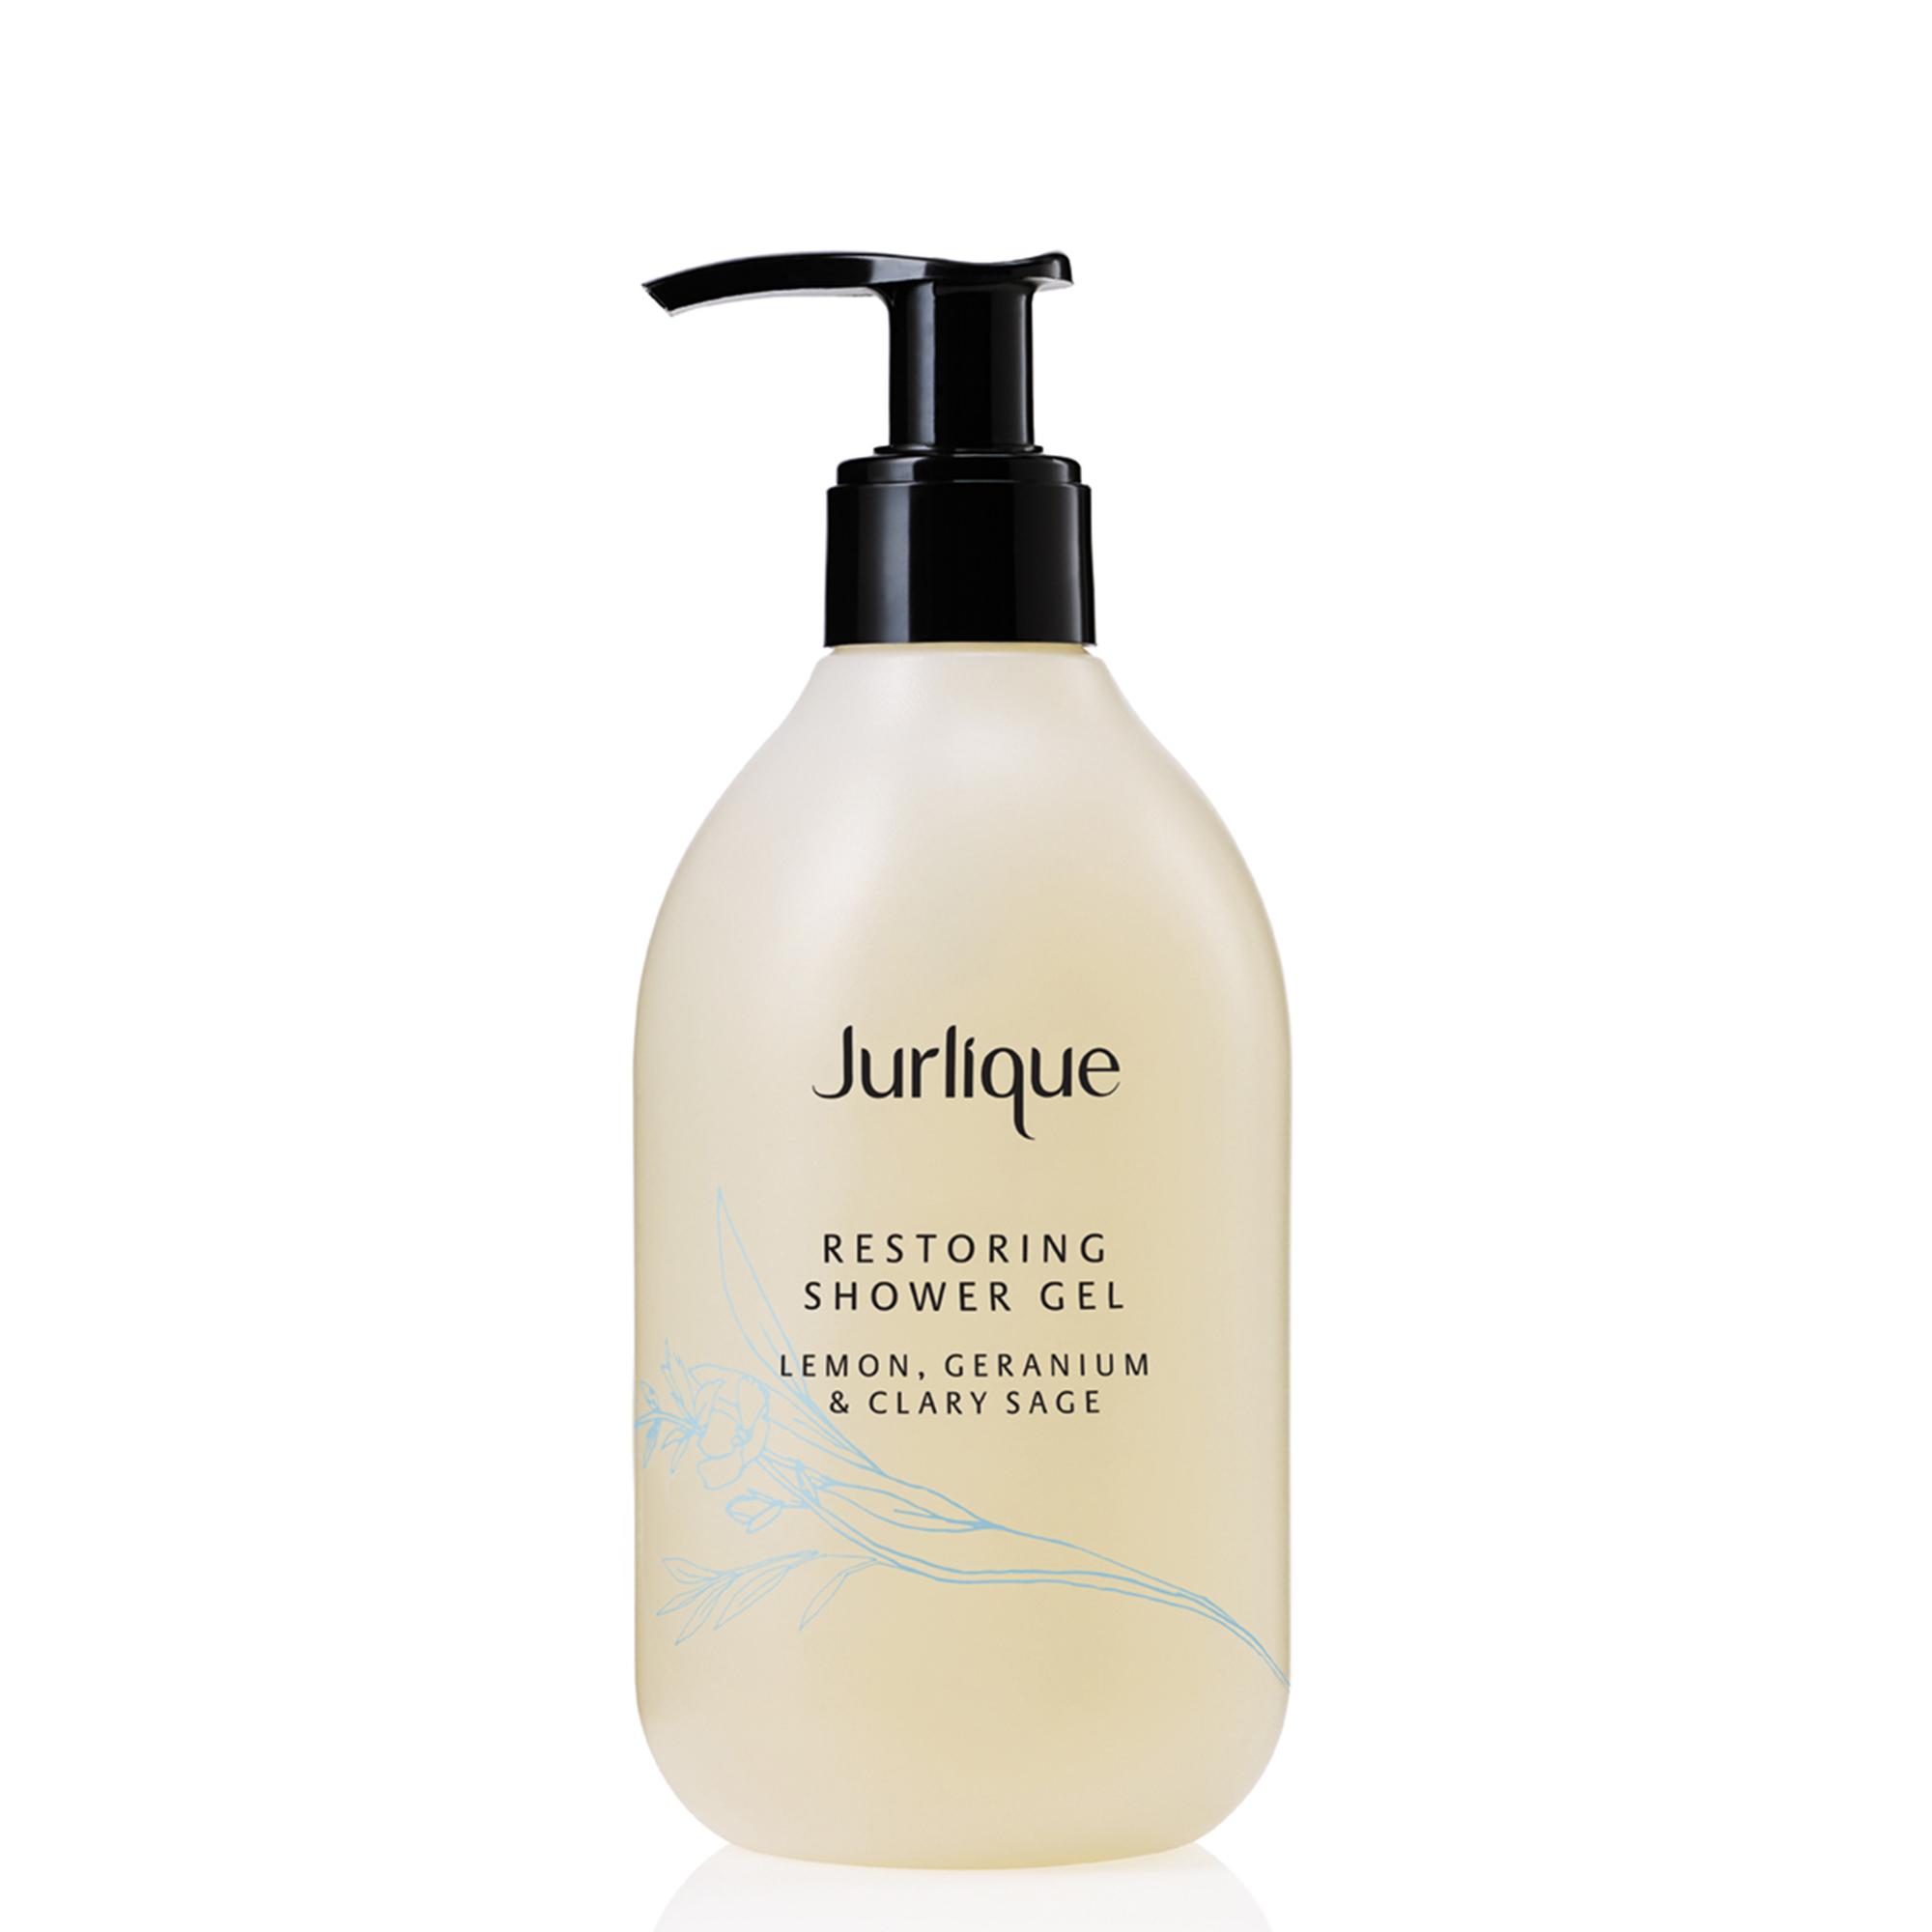 Jurlique Restoring Lemon, Geranium & Clary Sage Shower Gel, 300 ml